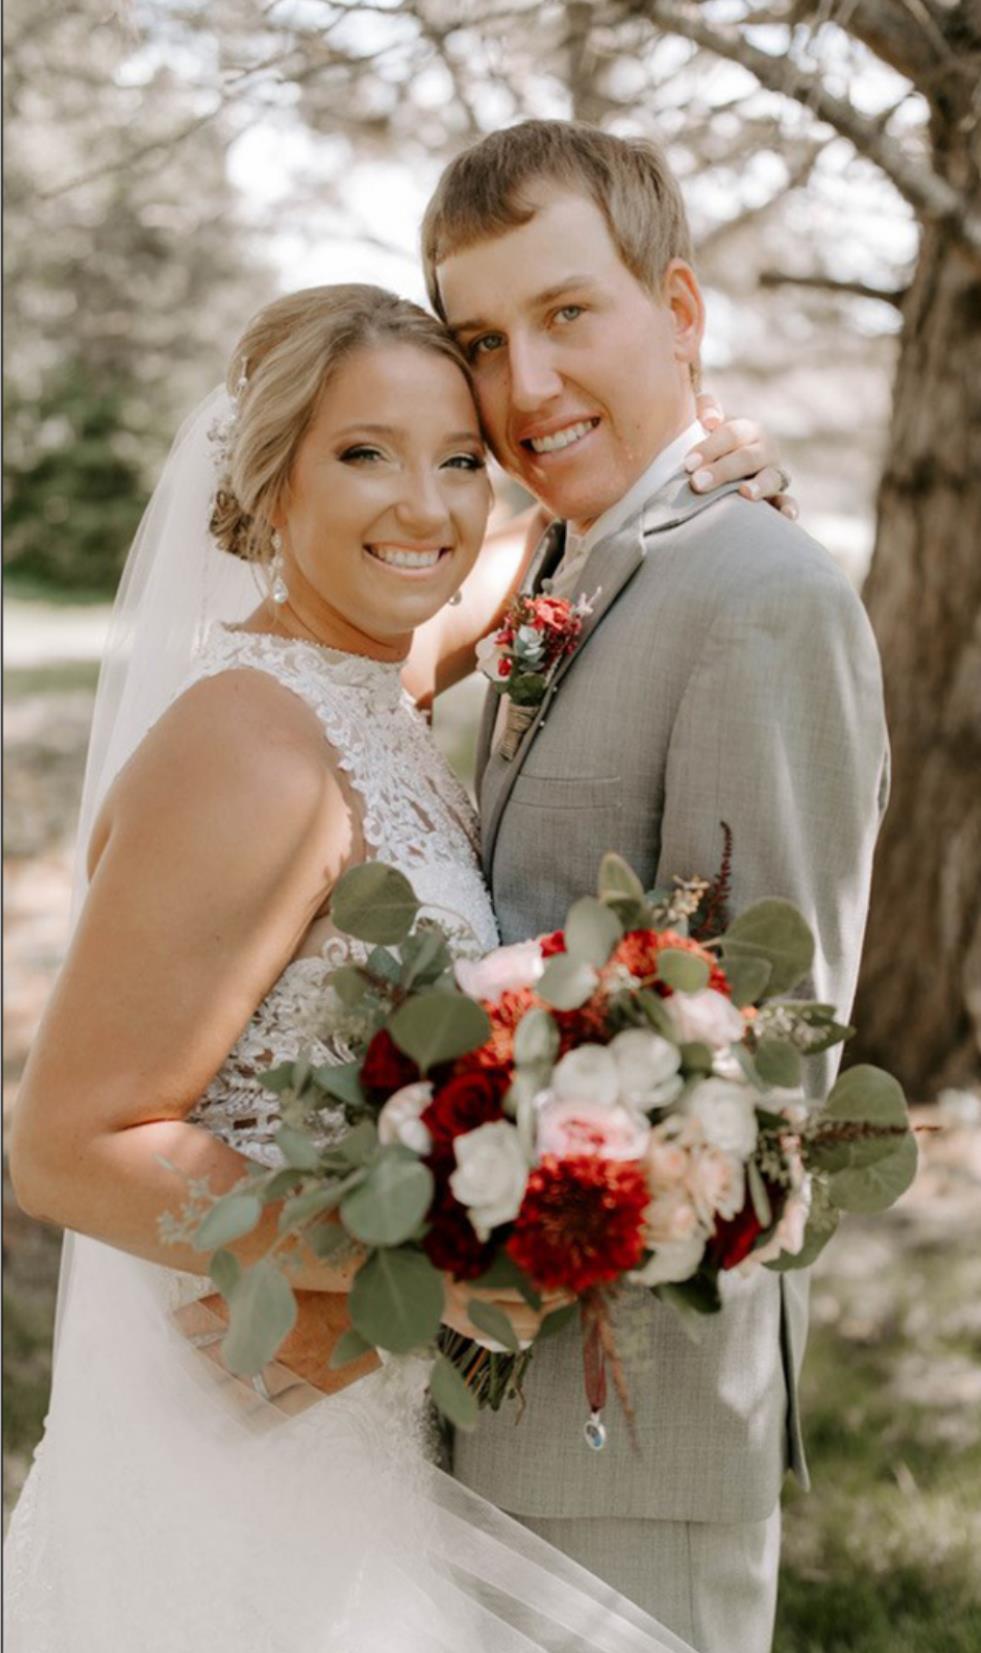 Mr. and Mrs. Connor Dethlefts